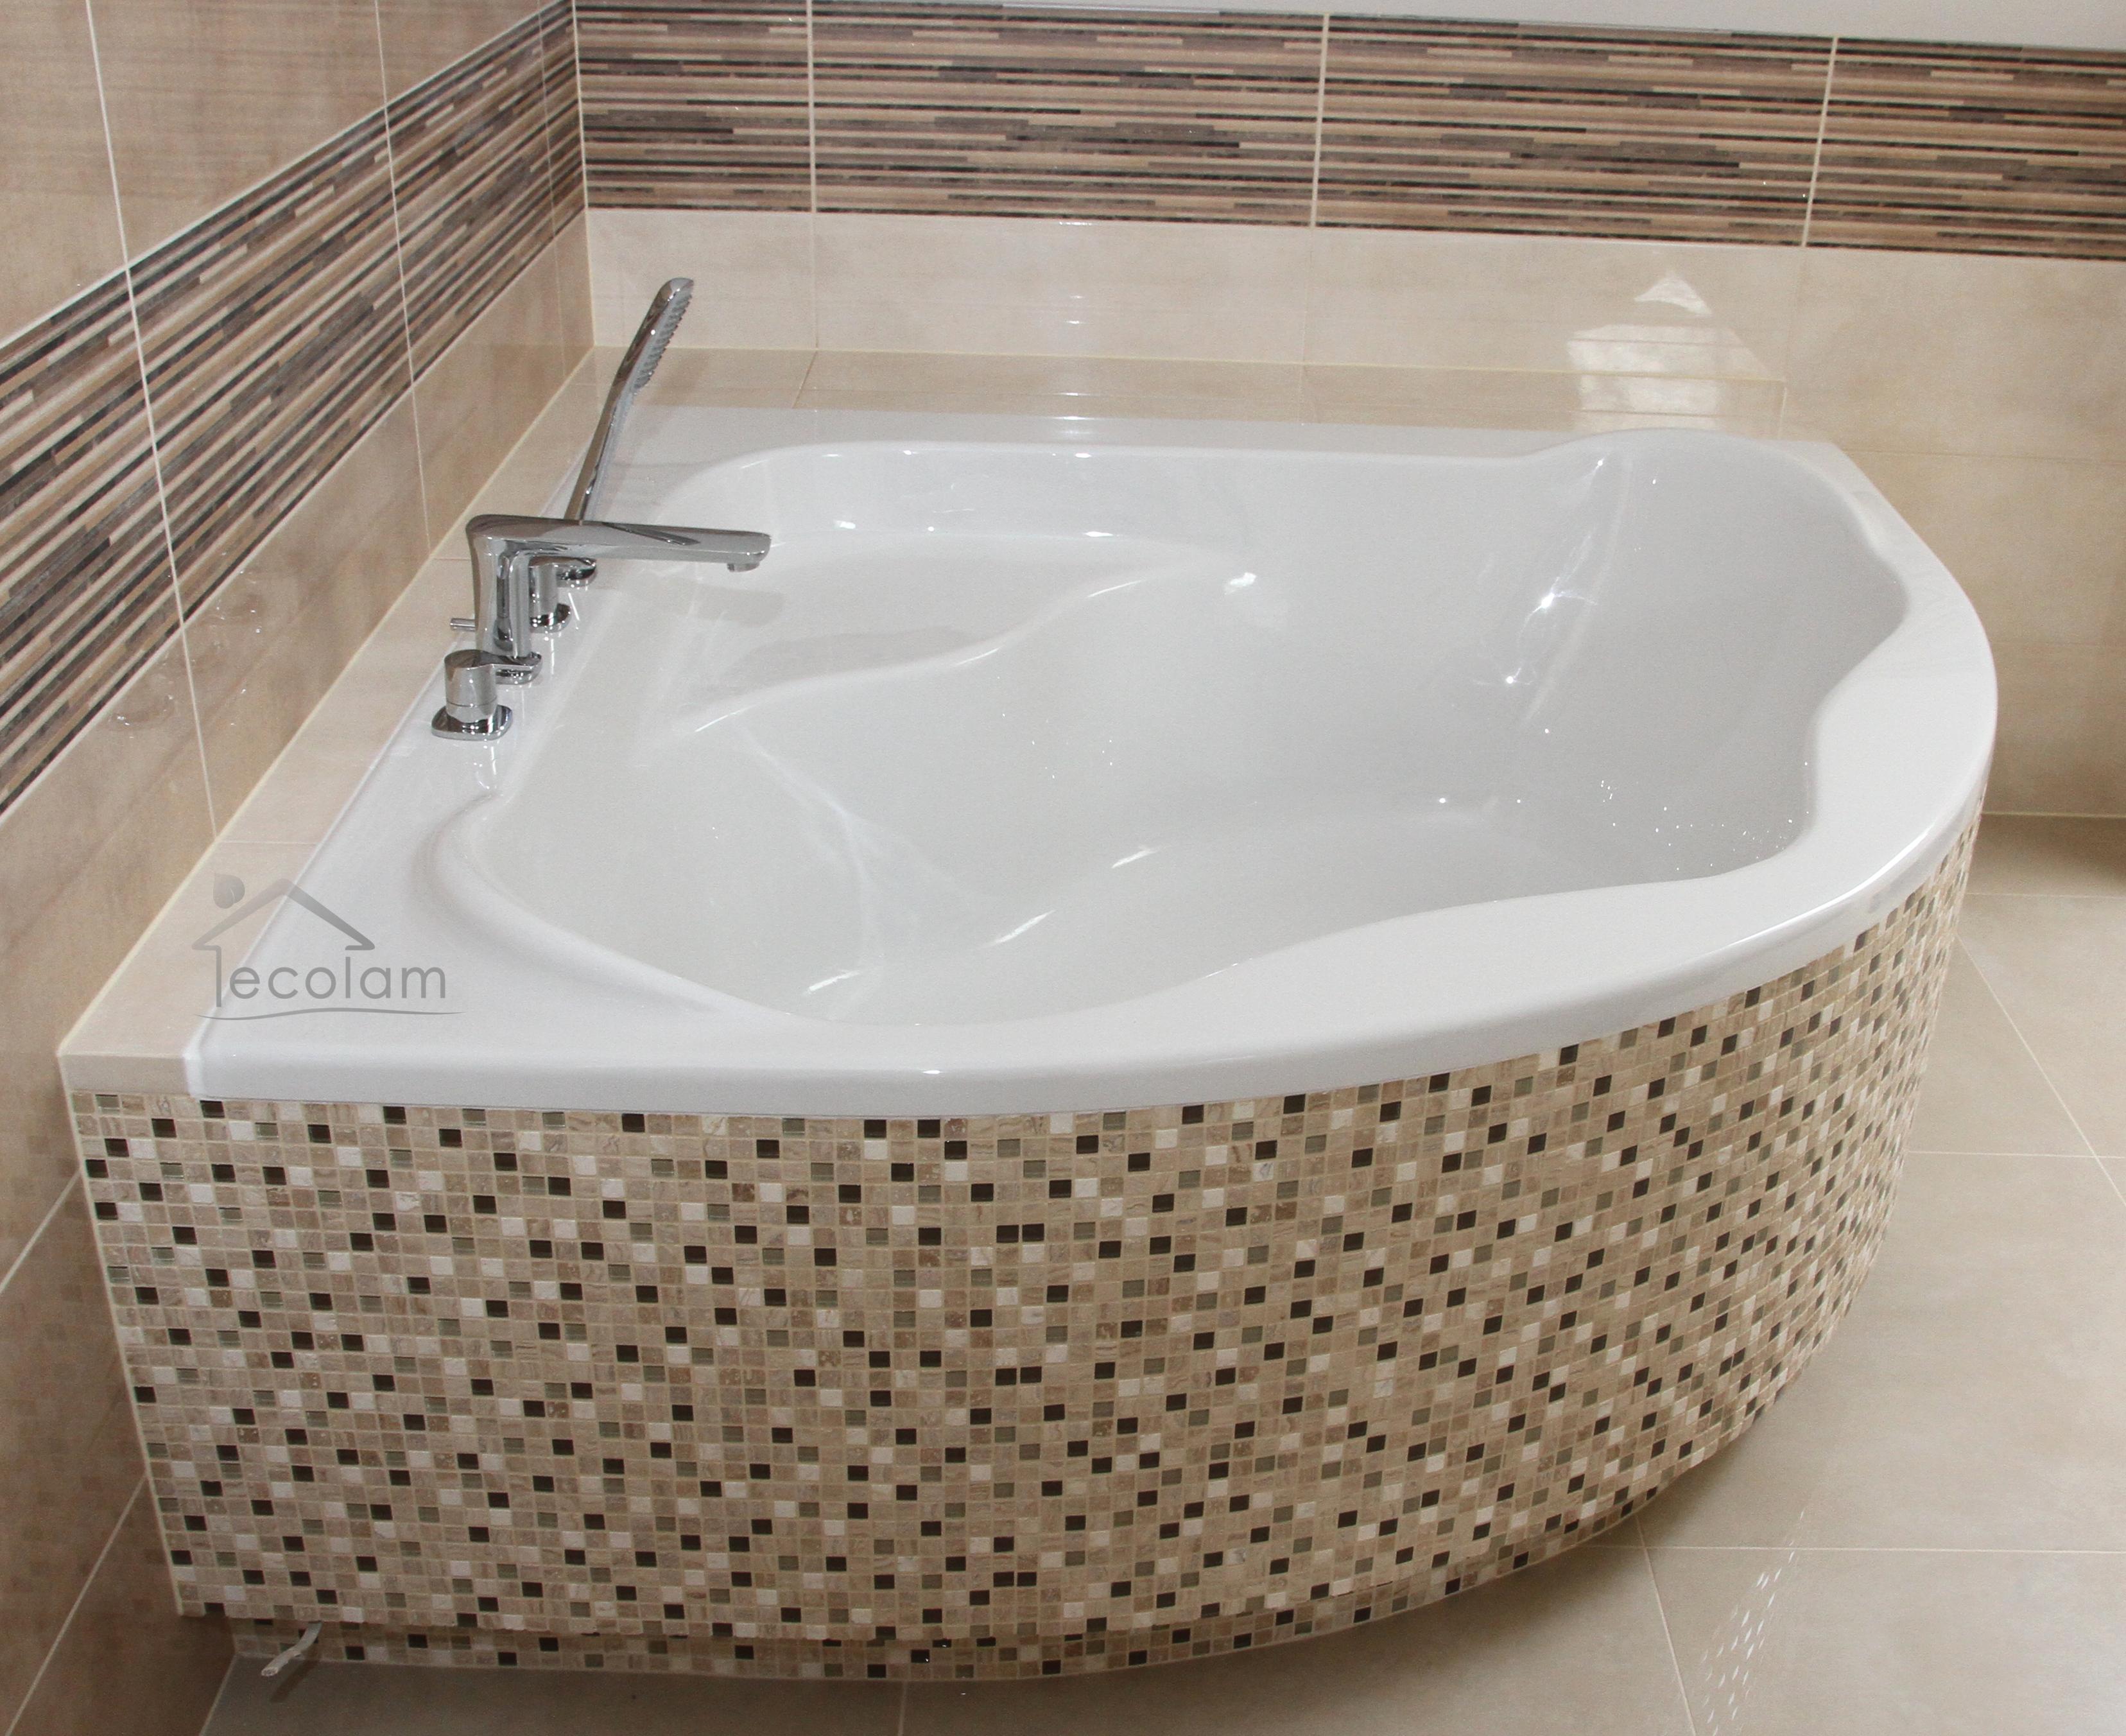 badewanne eckbadewanne 140 x 140 cm wannentr ger f e. Black Bedroom Furniture Sets. Home Design Ideas